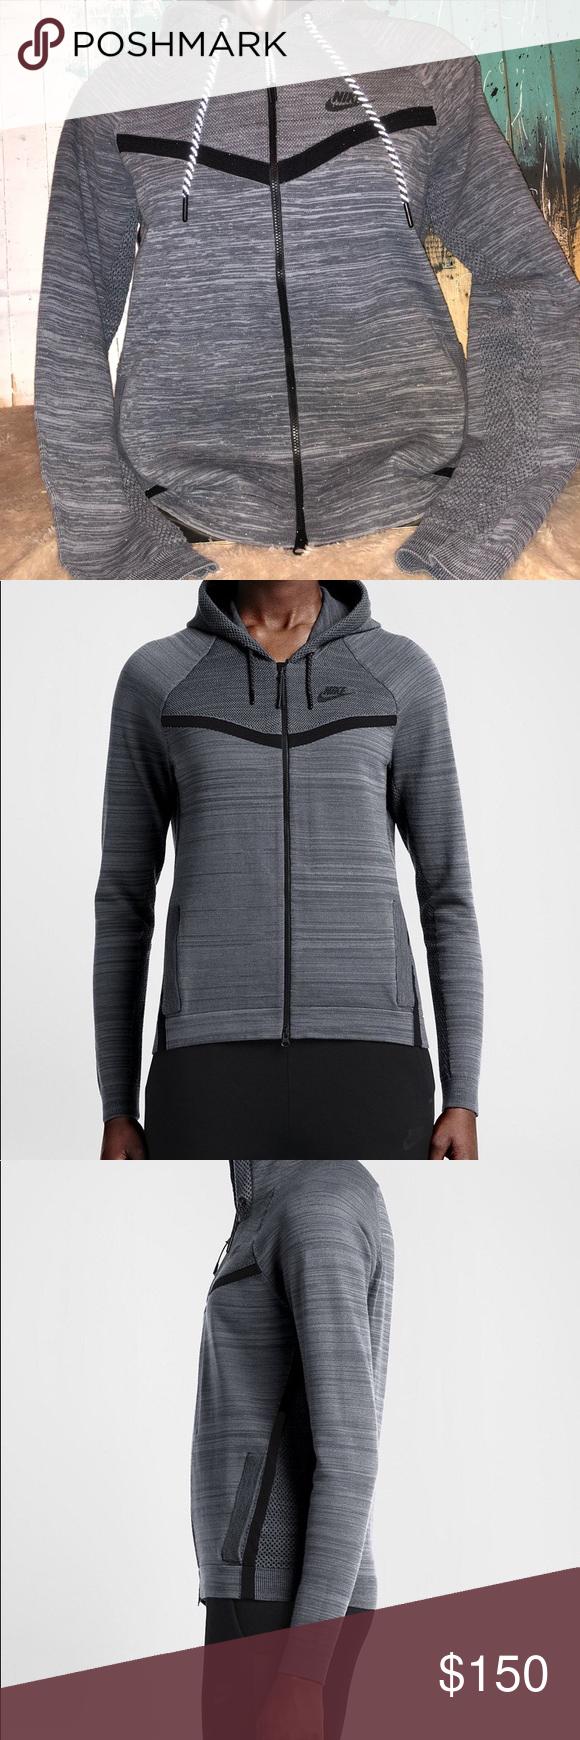 817f69042d4e Nike Women s Sportswear Tech Knit Jacket Nike Women s Sportswear Tech Knit  Windrunner Jacket Size Medium New With Tags Retail  250 Nike Jackets   Coats